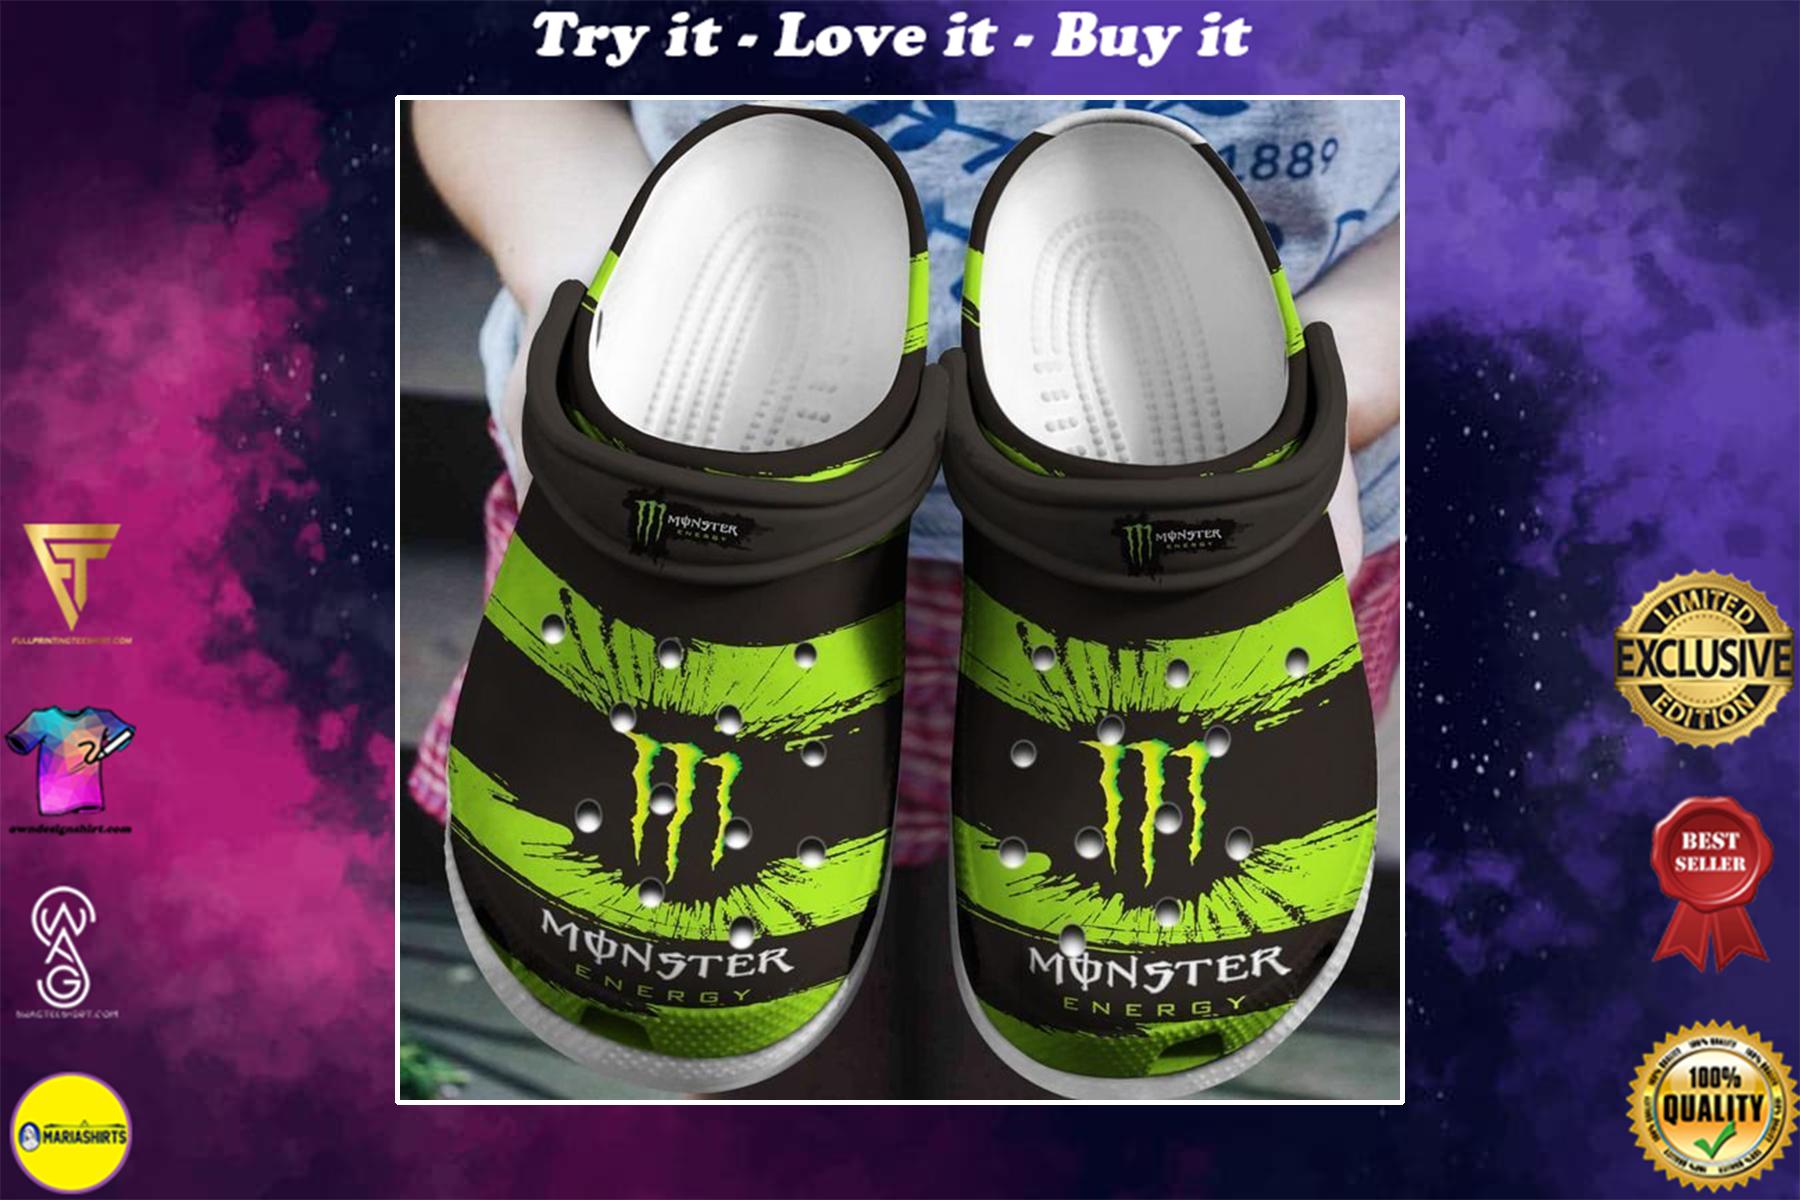 monster energy drink crocs - Copy